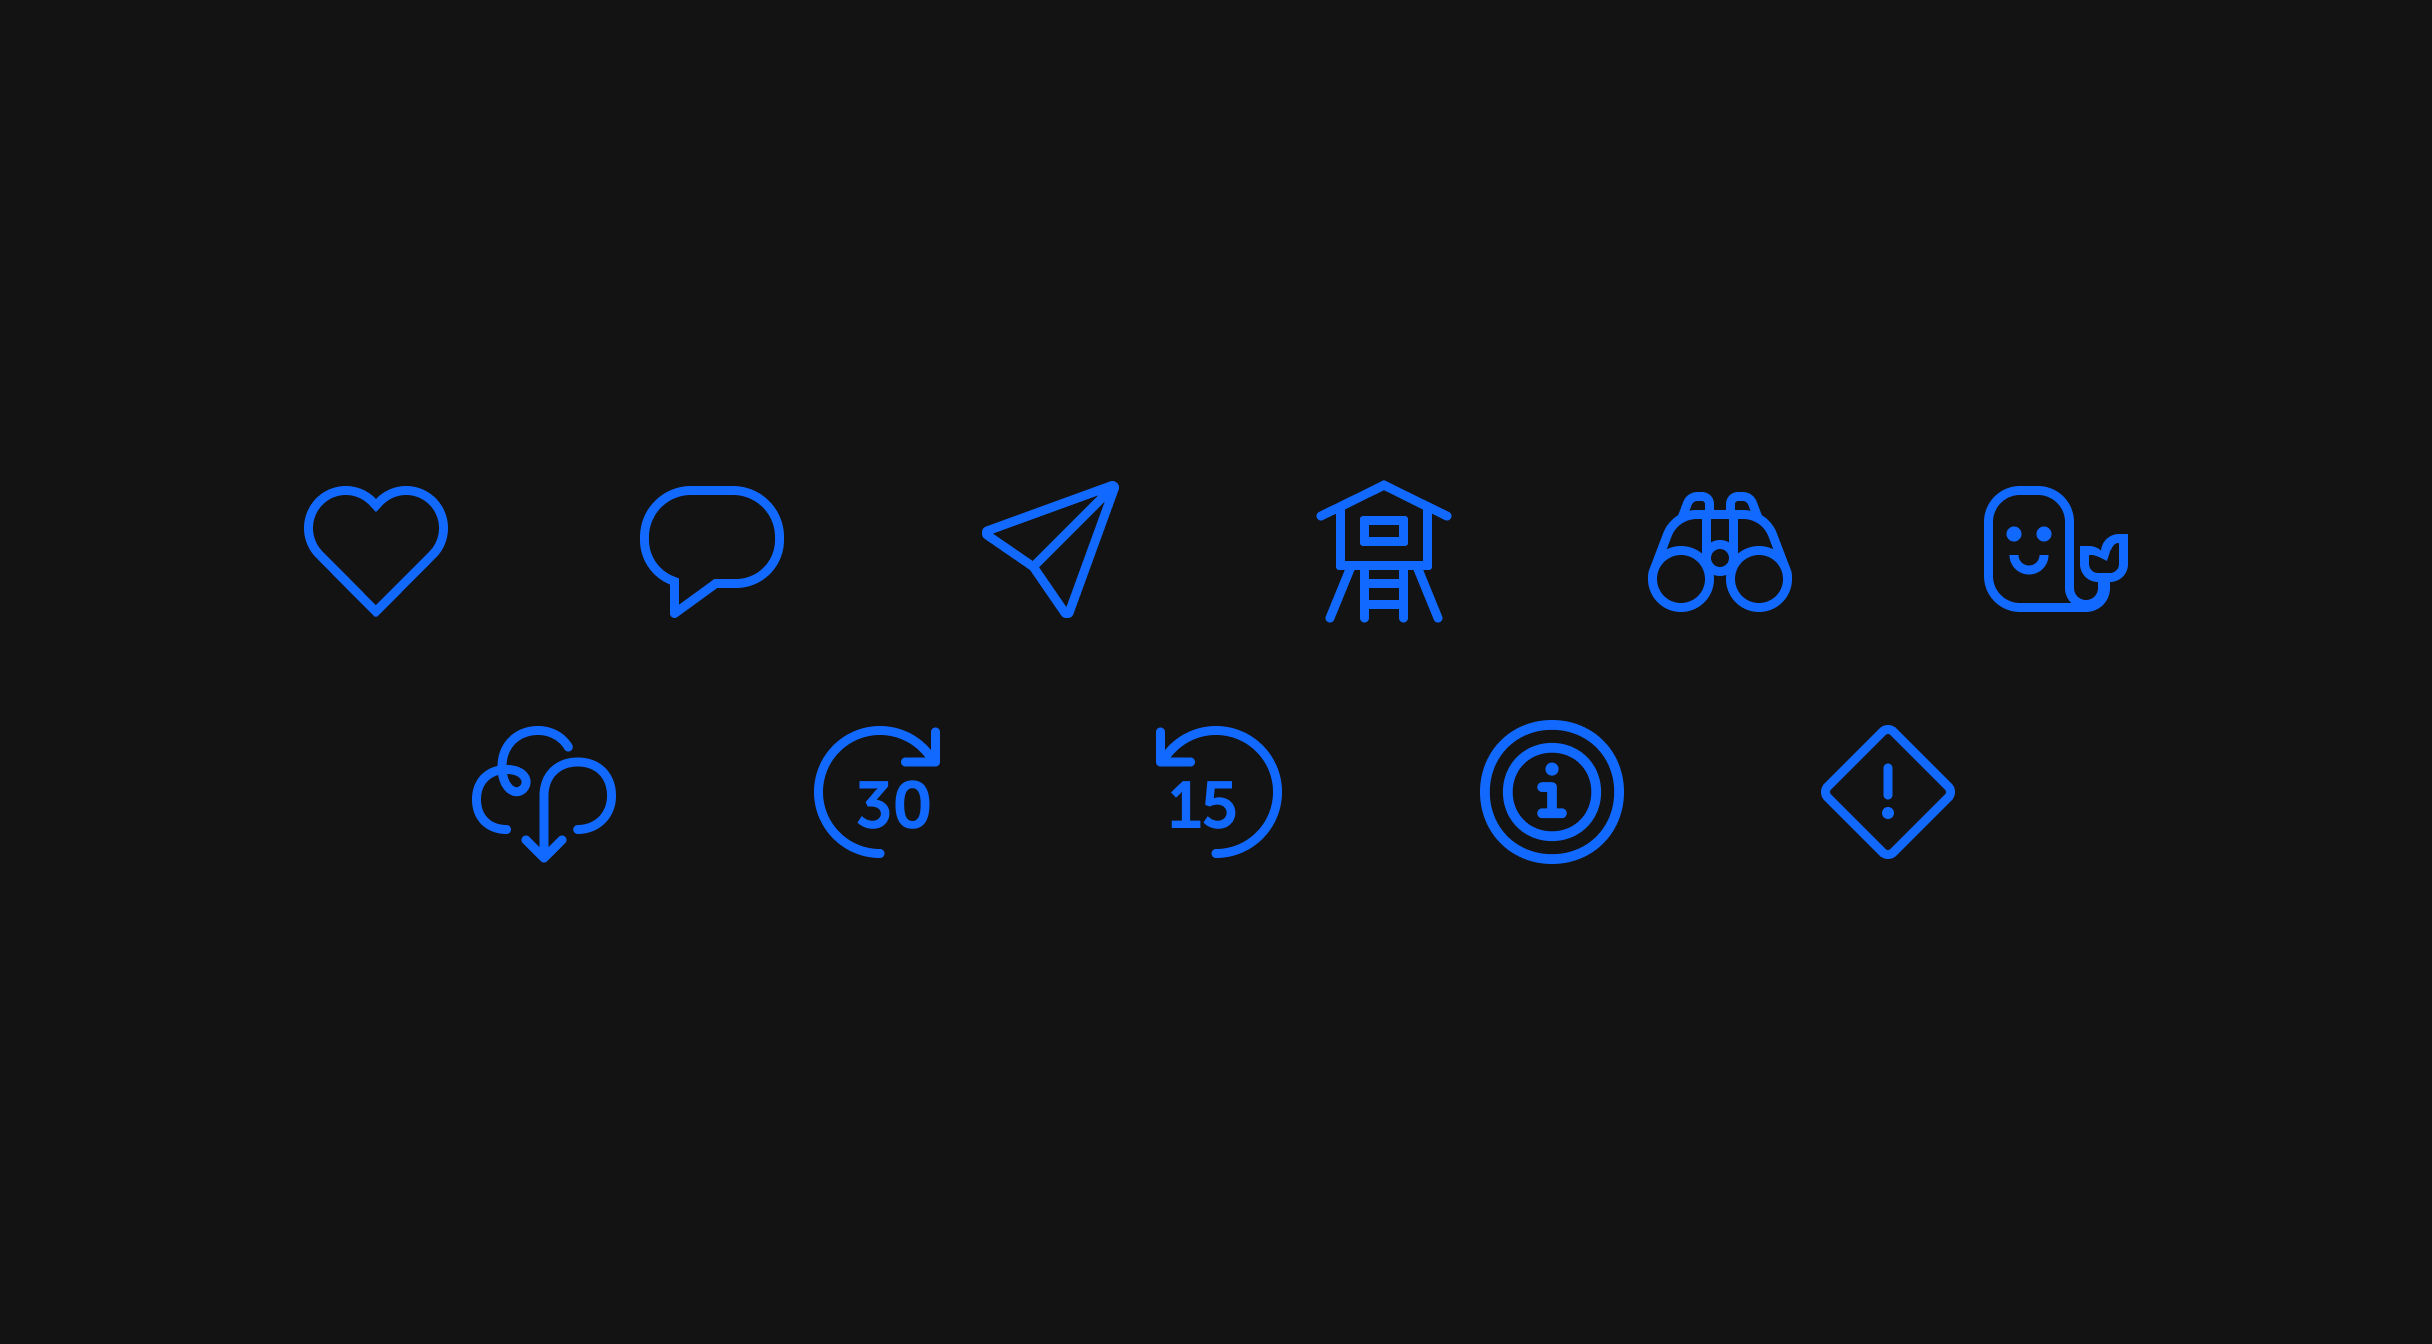 Breaker User Interface Icons